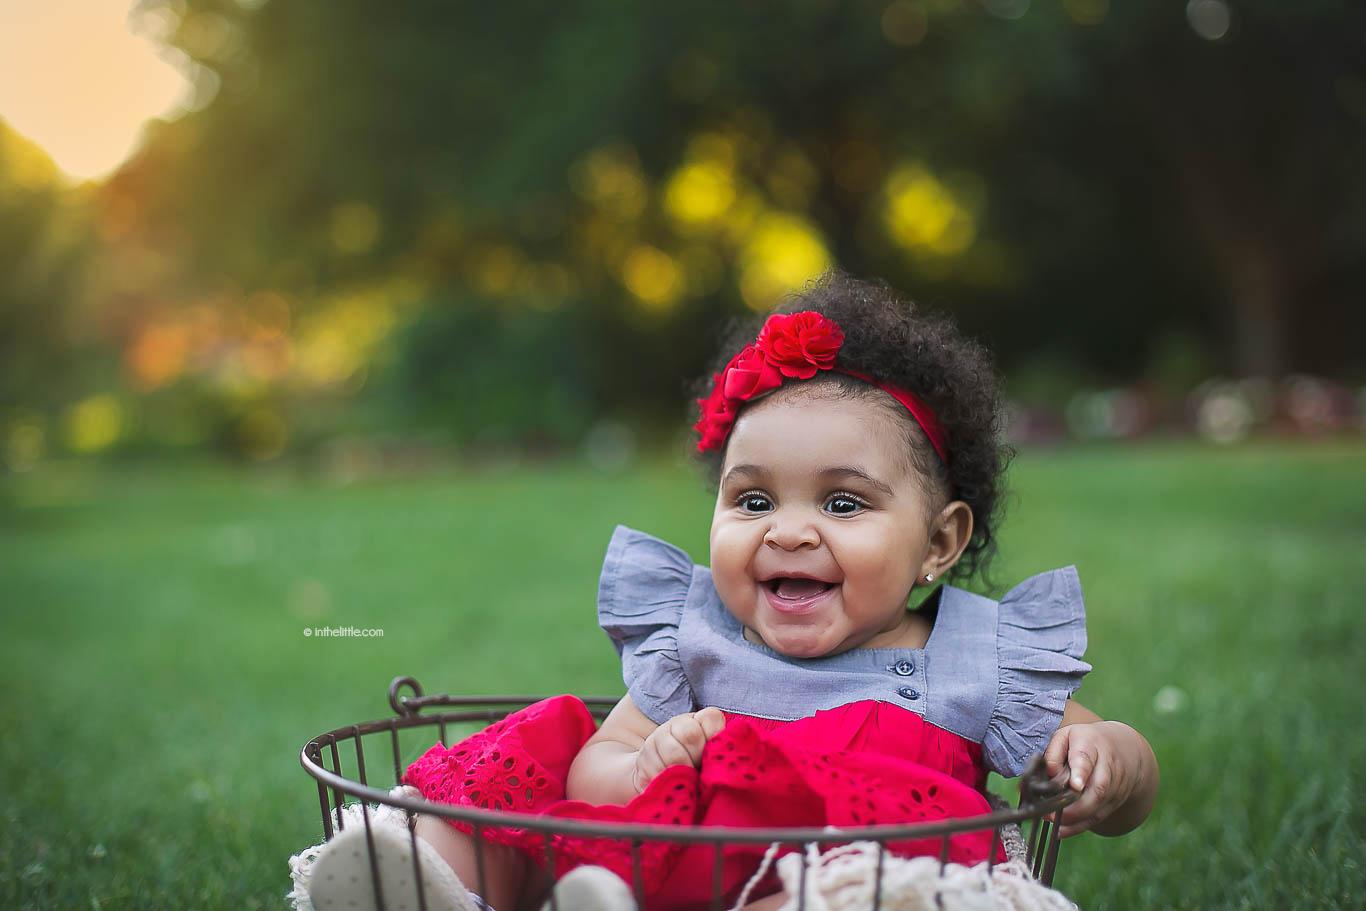 Saint Louis Baby Photographers Lifestyle Pictures